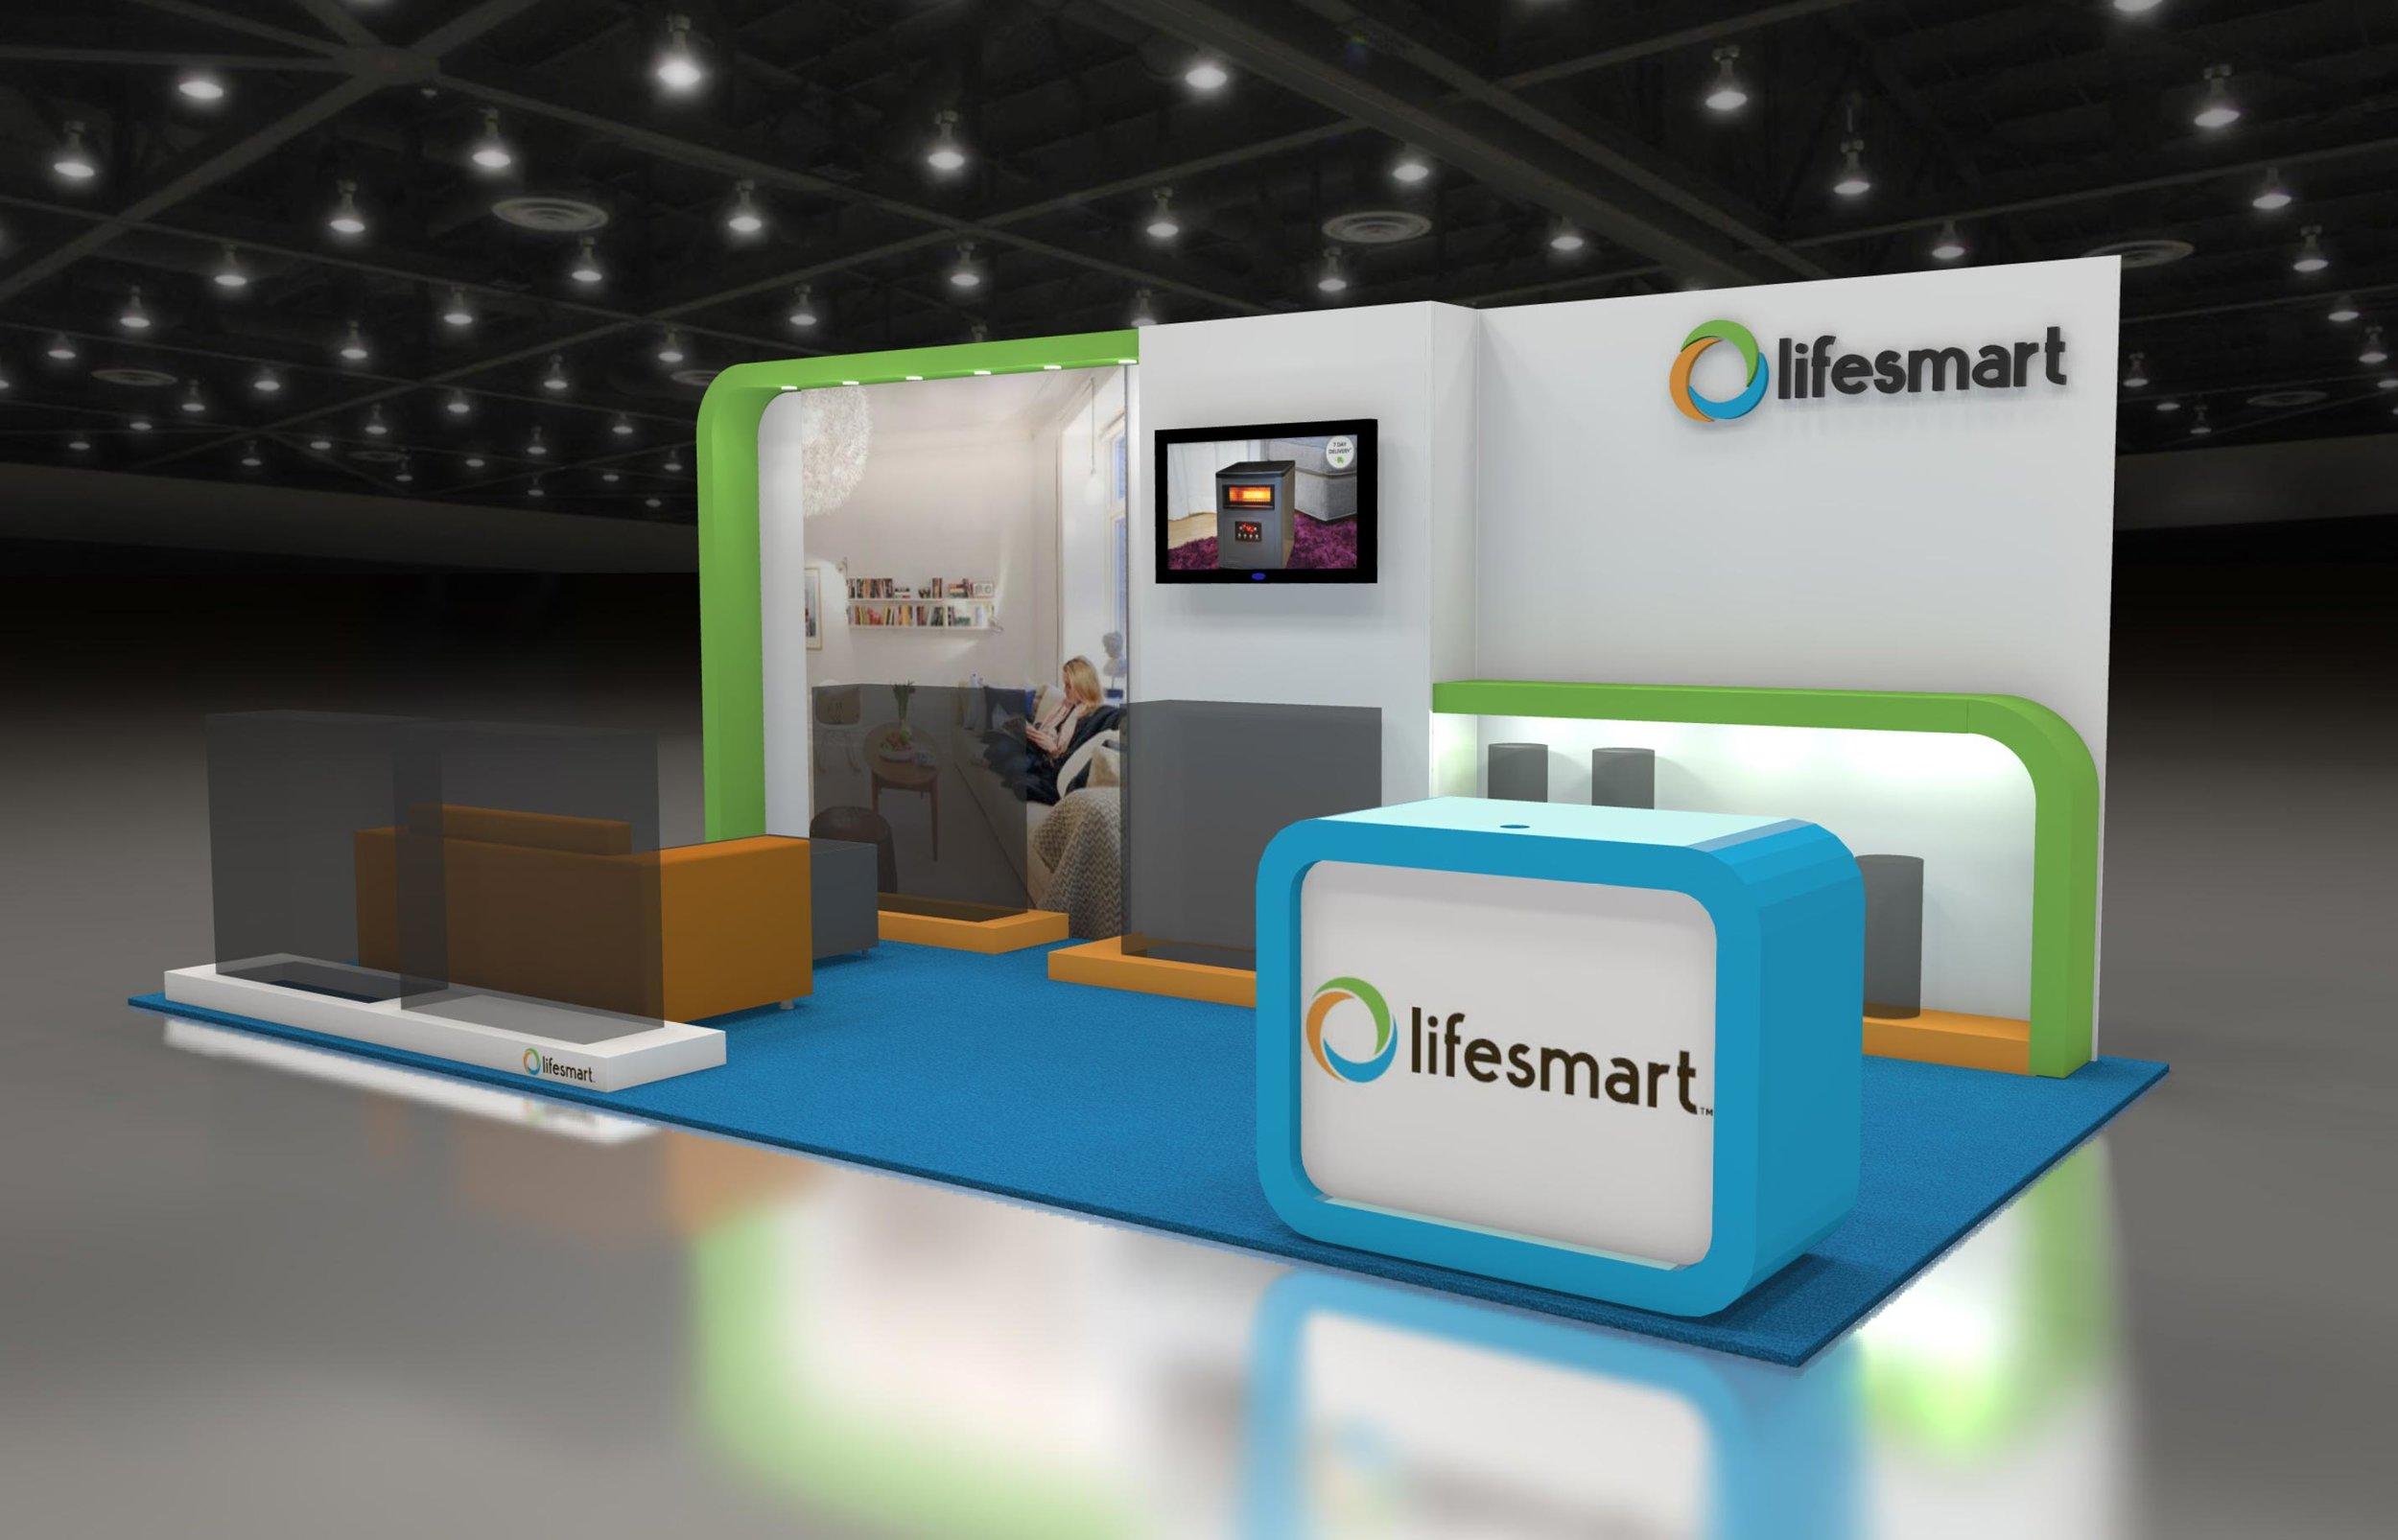 lifesmart_large_tradeshow.jpg